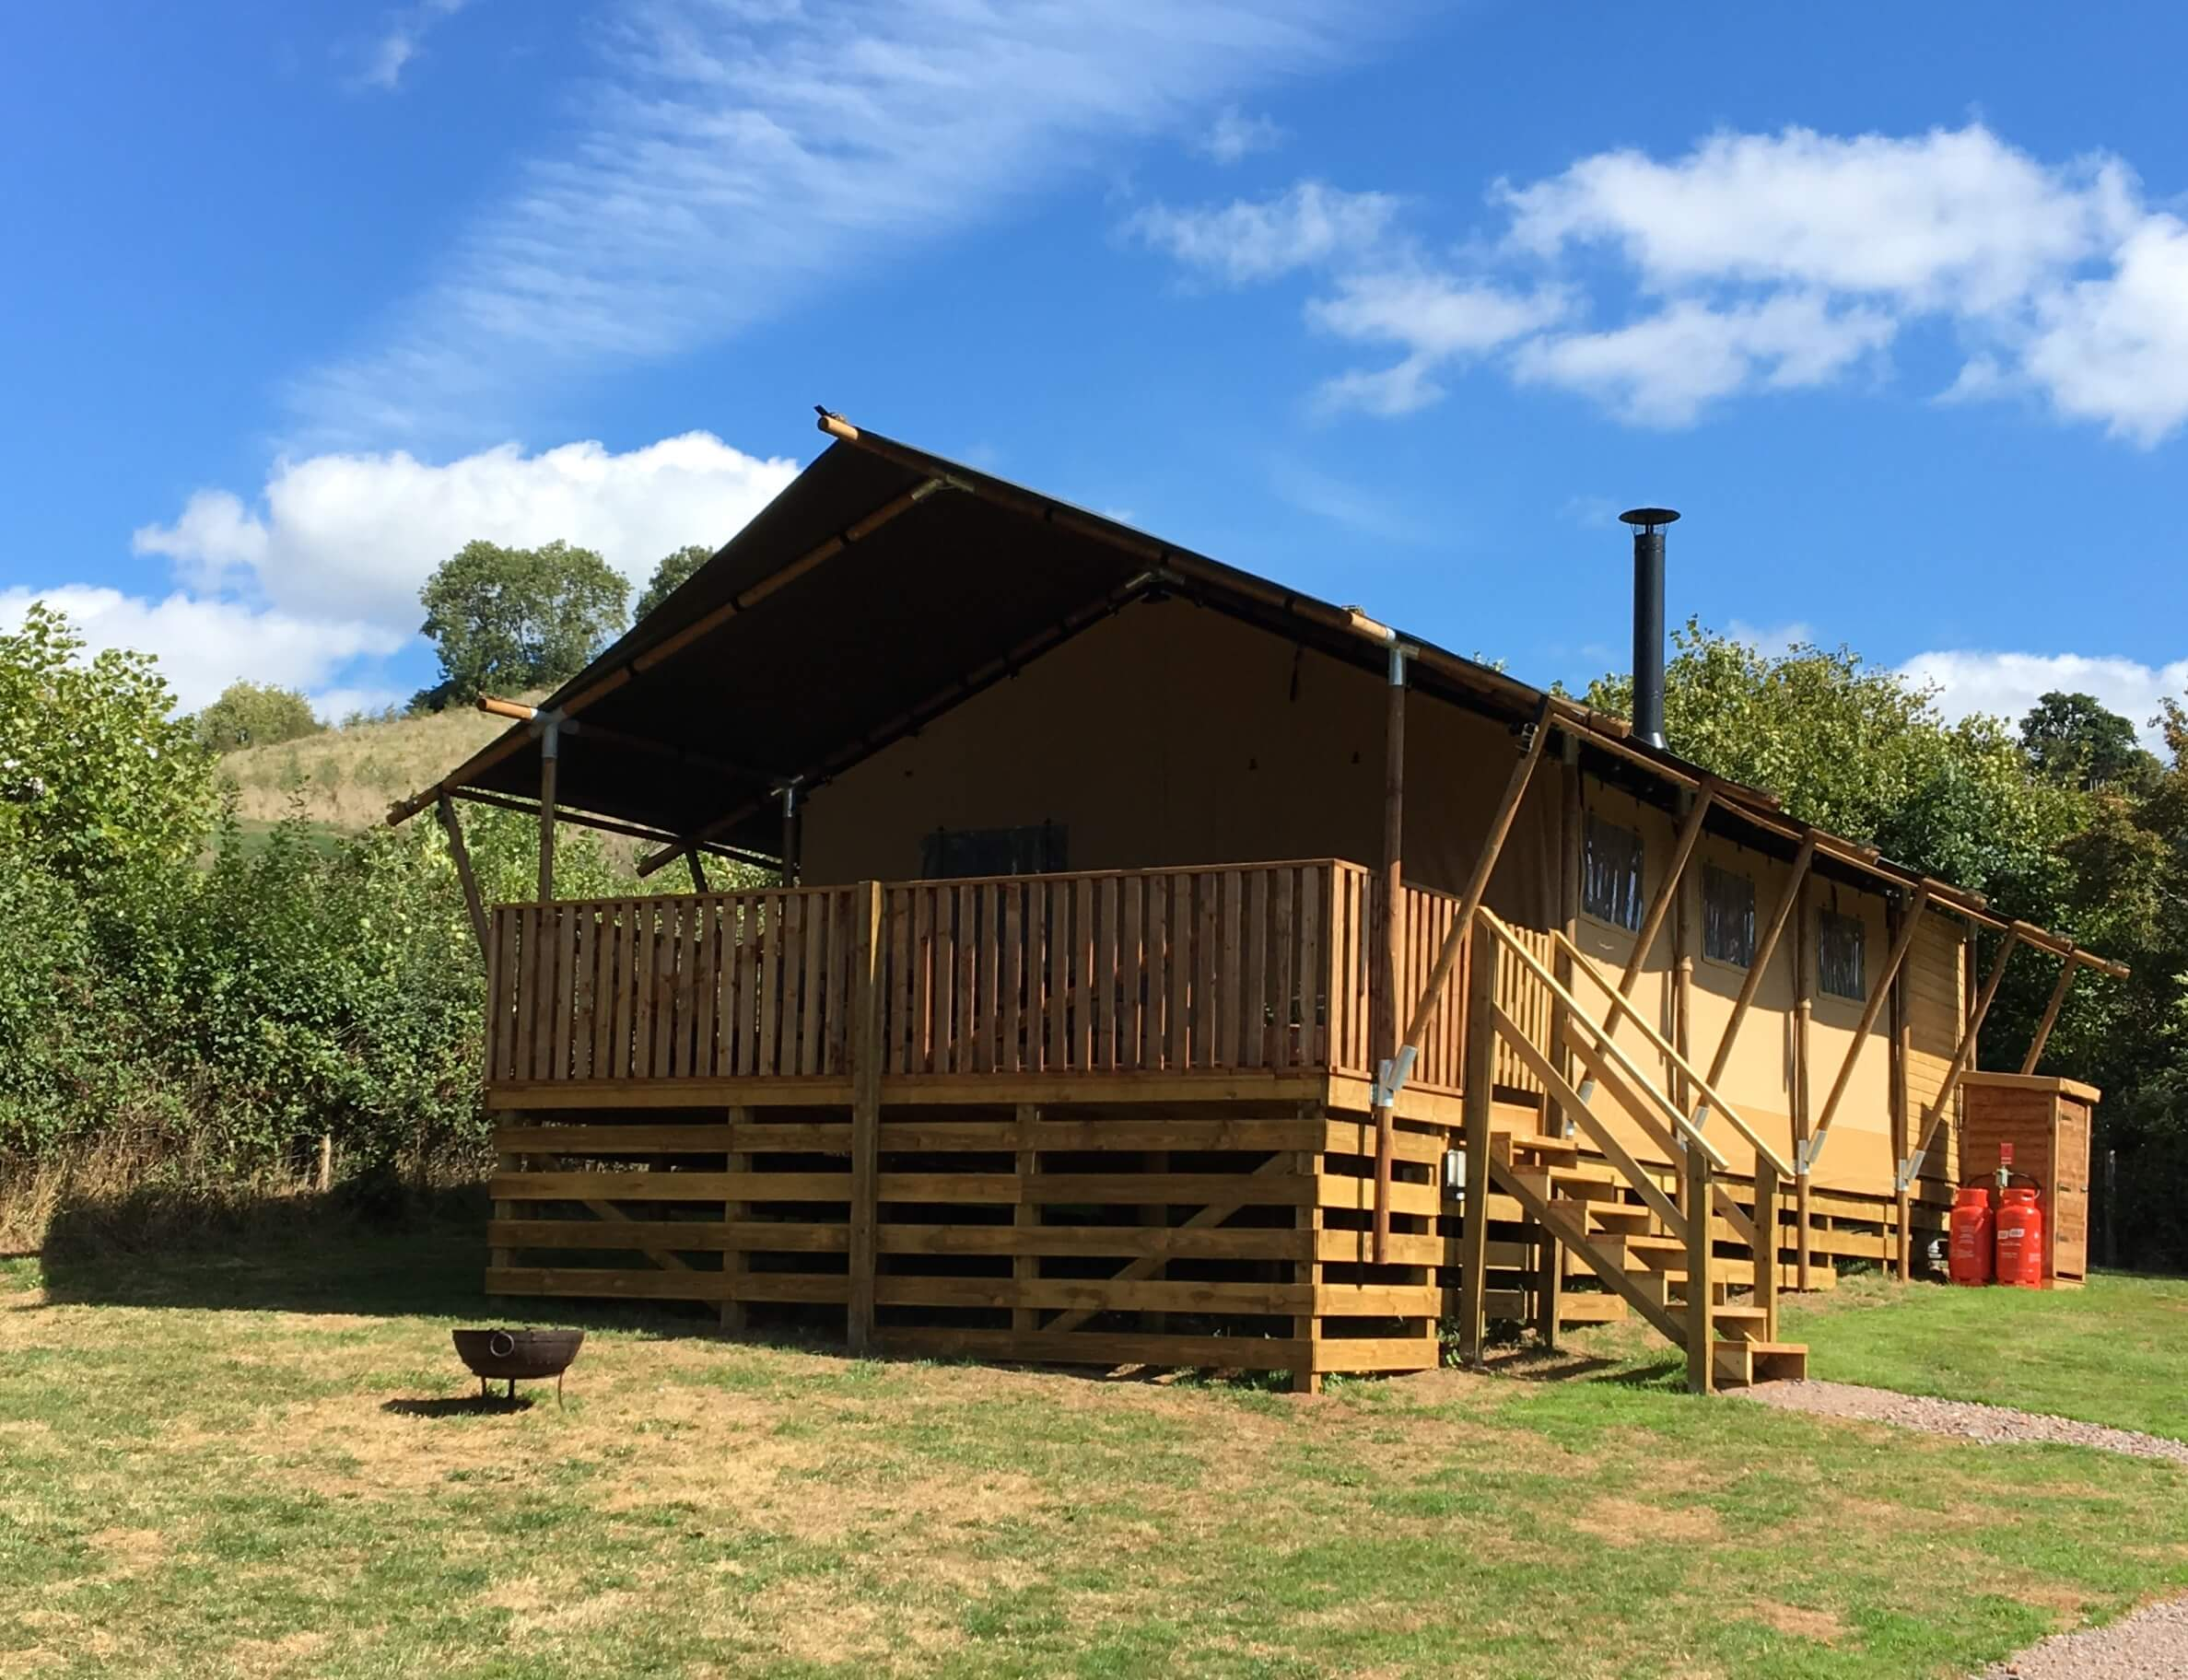 Our Birch Glamping Safari Tent